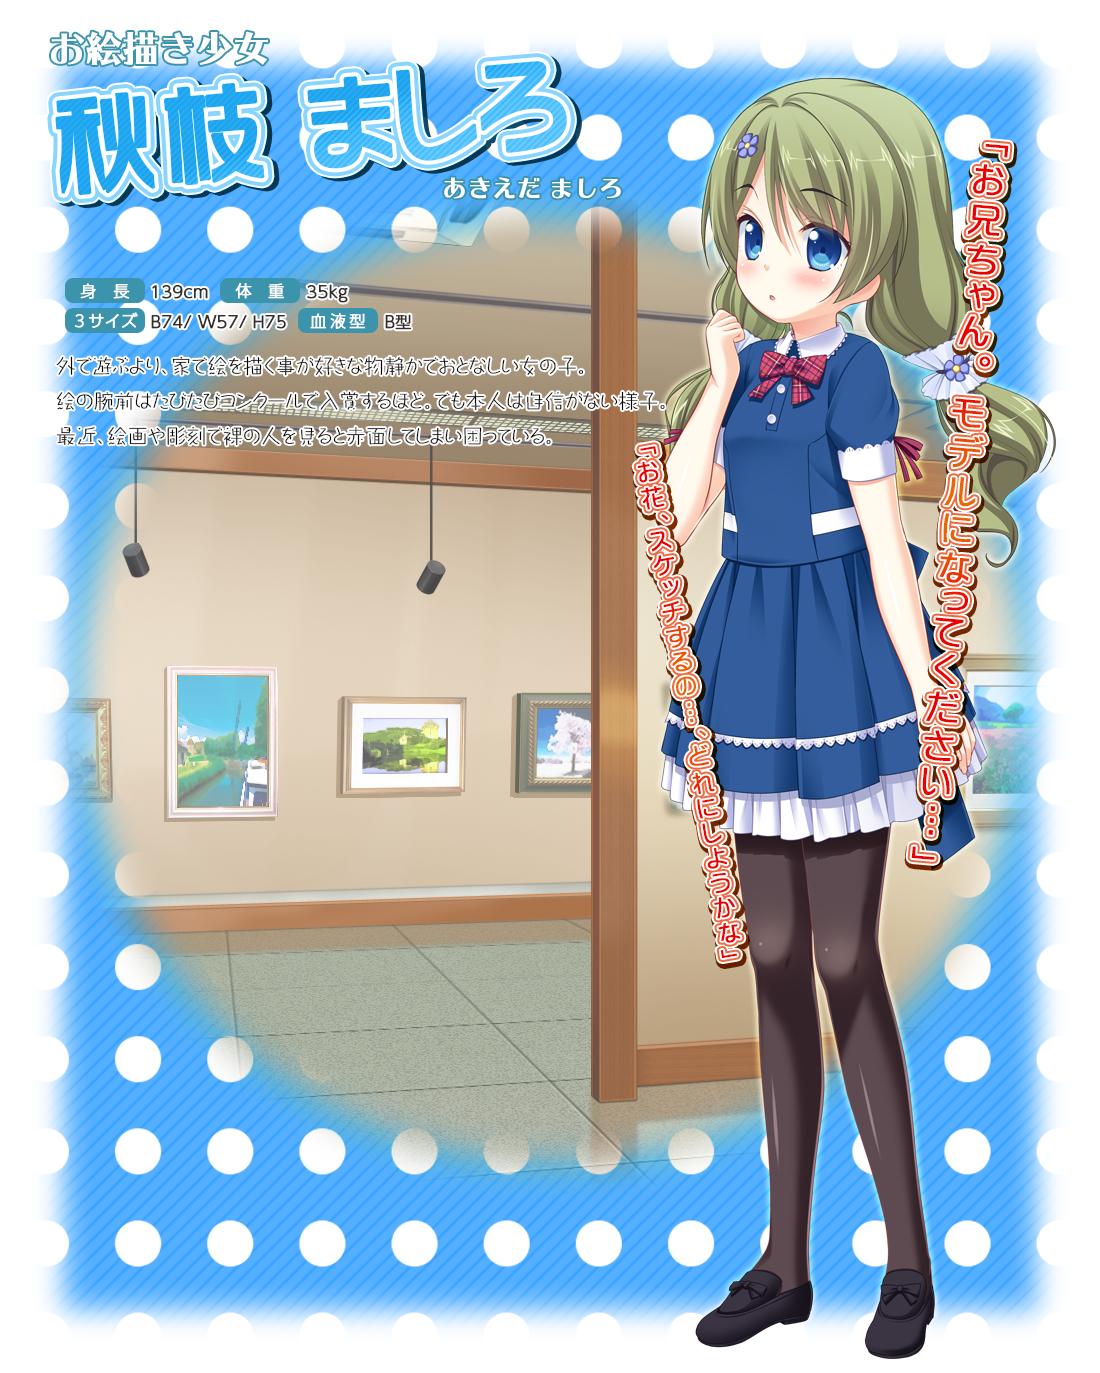 character_back_mashiro.png